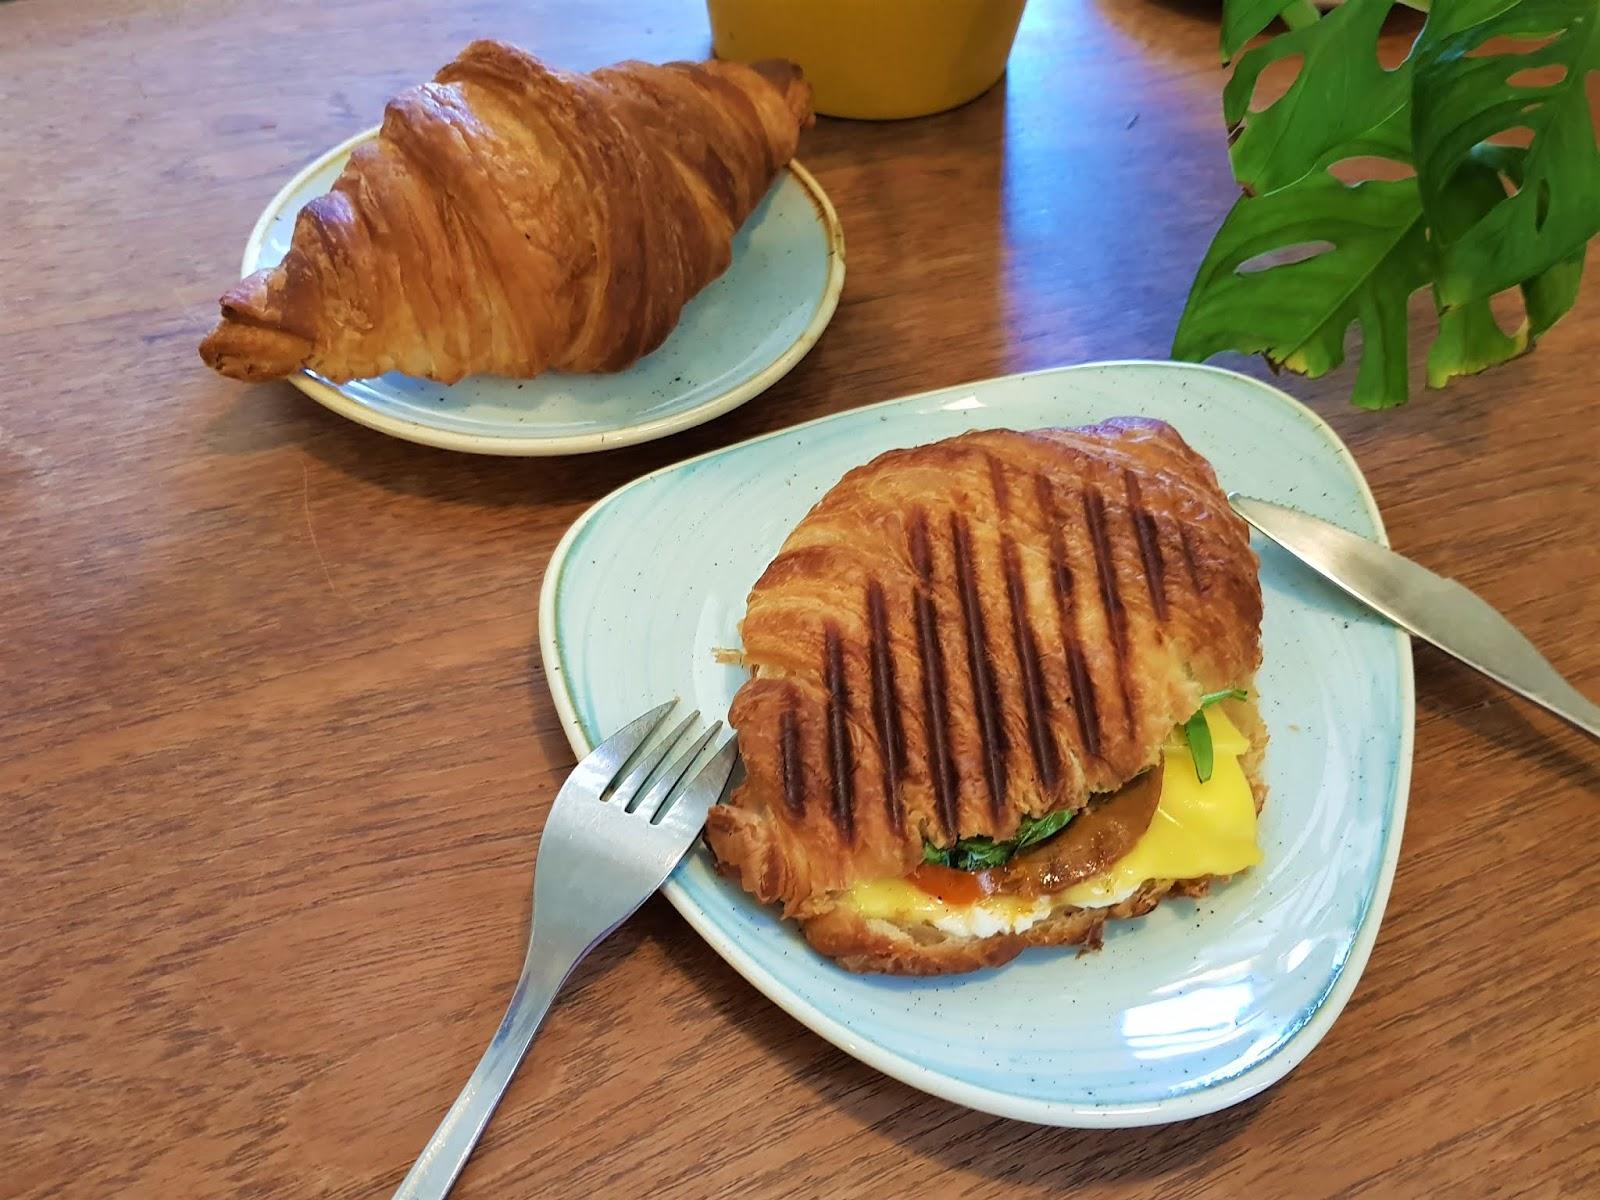 Kaf Vegan Bakery Copenhagen -  Best vegan restaurants in Copenhagen -  Copenhagen Travel Guide